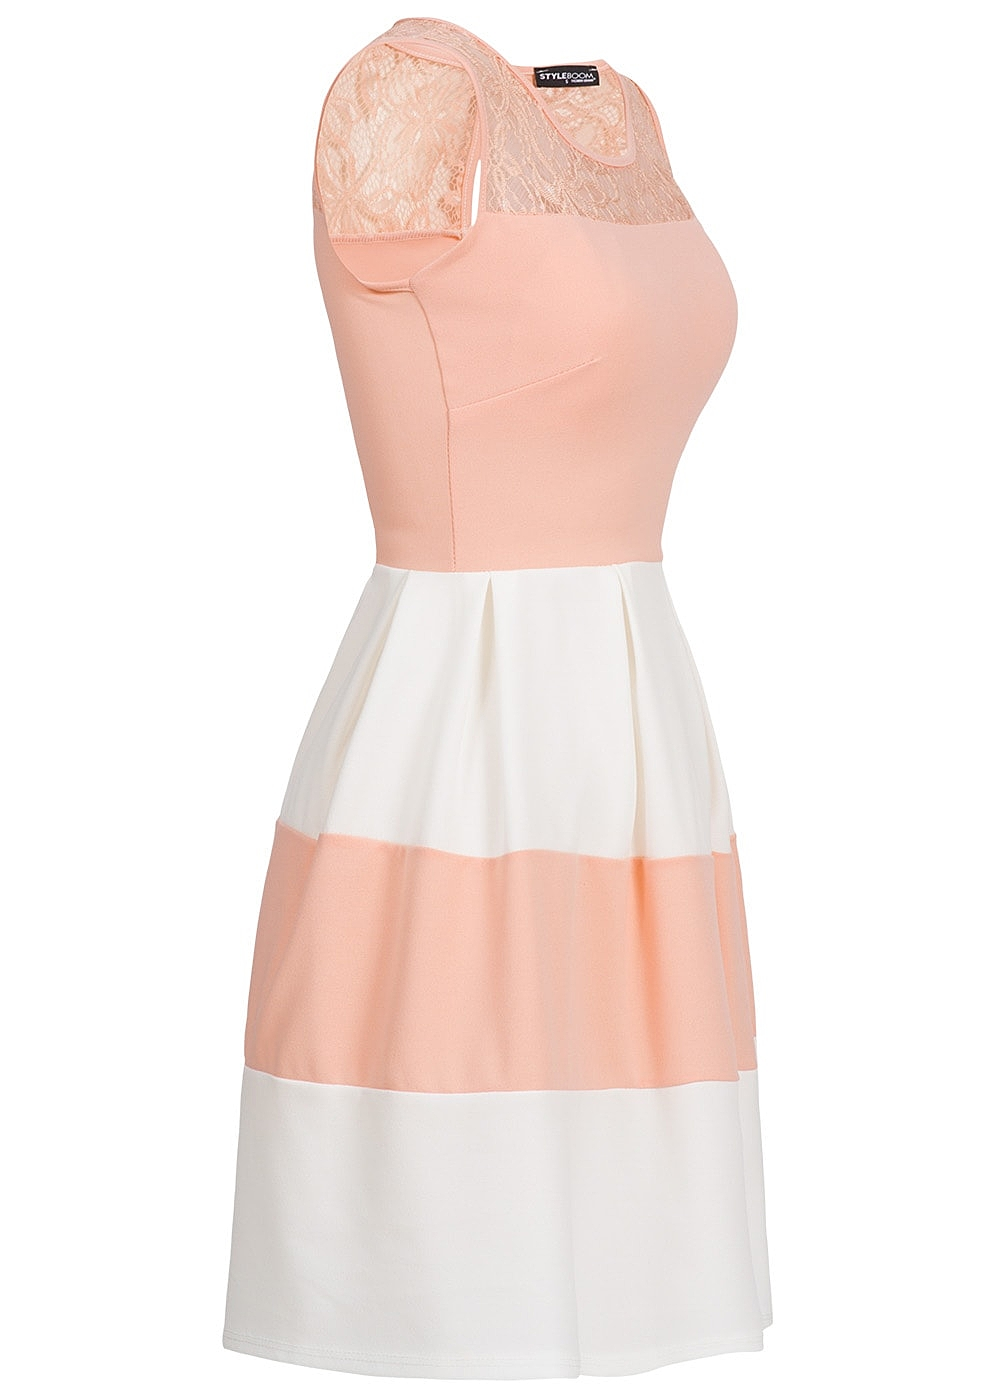 Kleid rosa lila gestreift